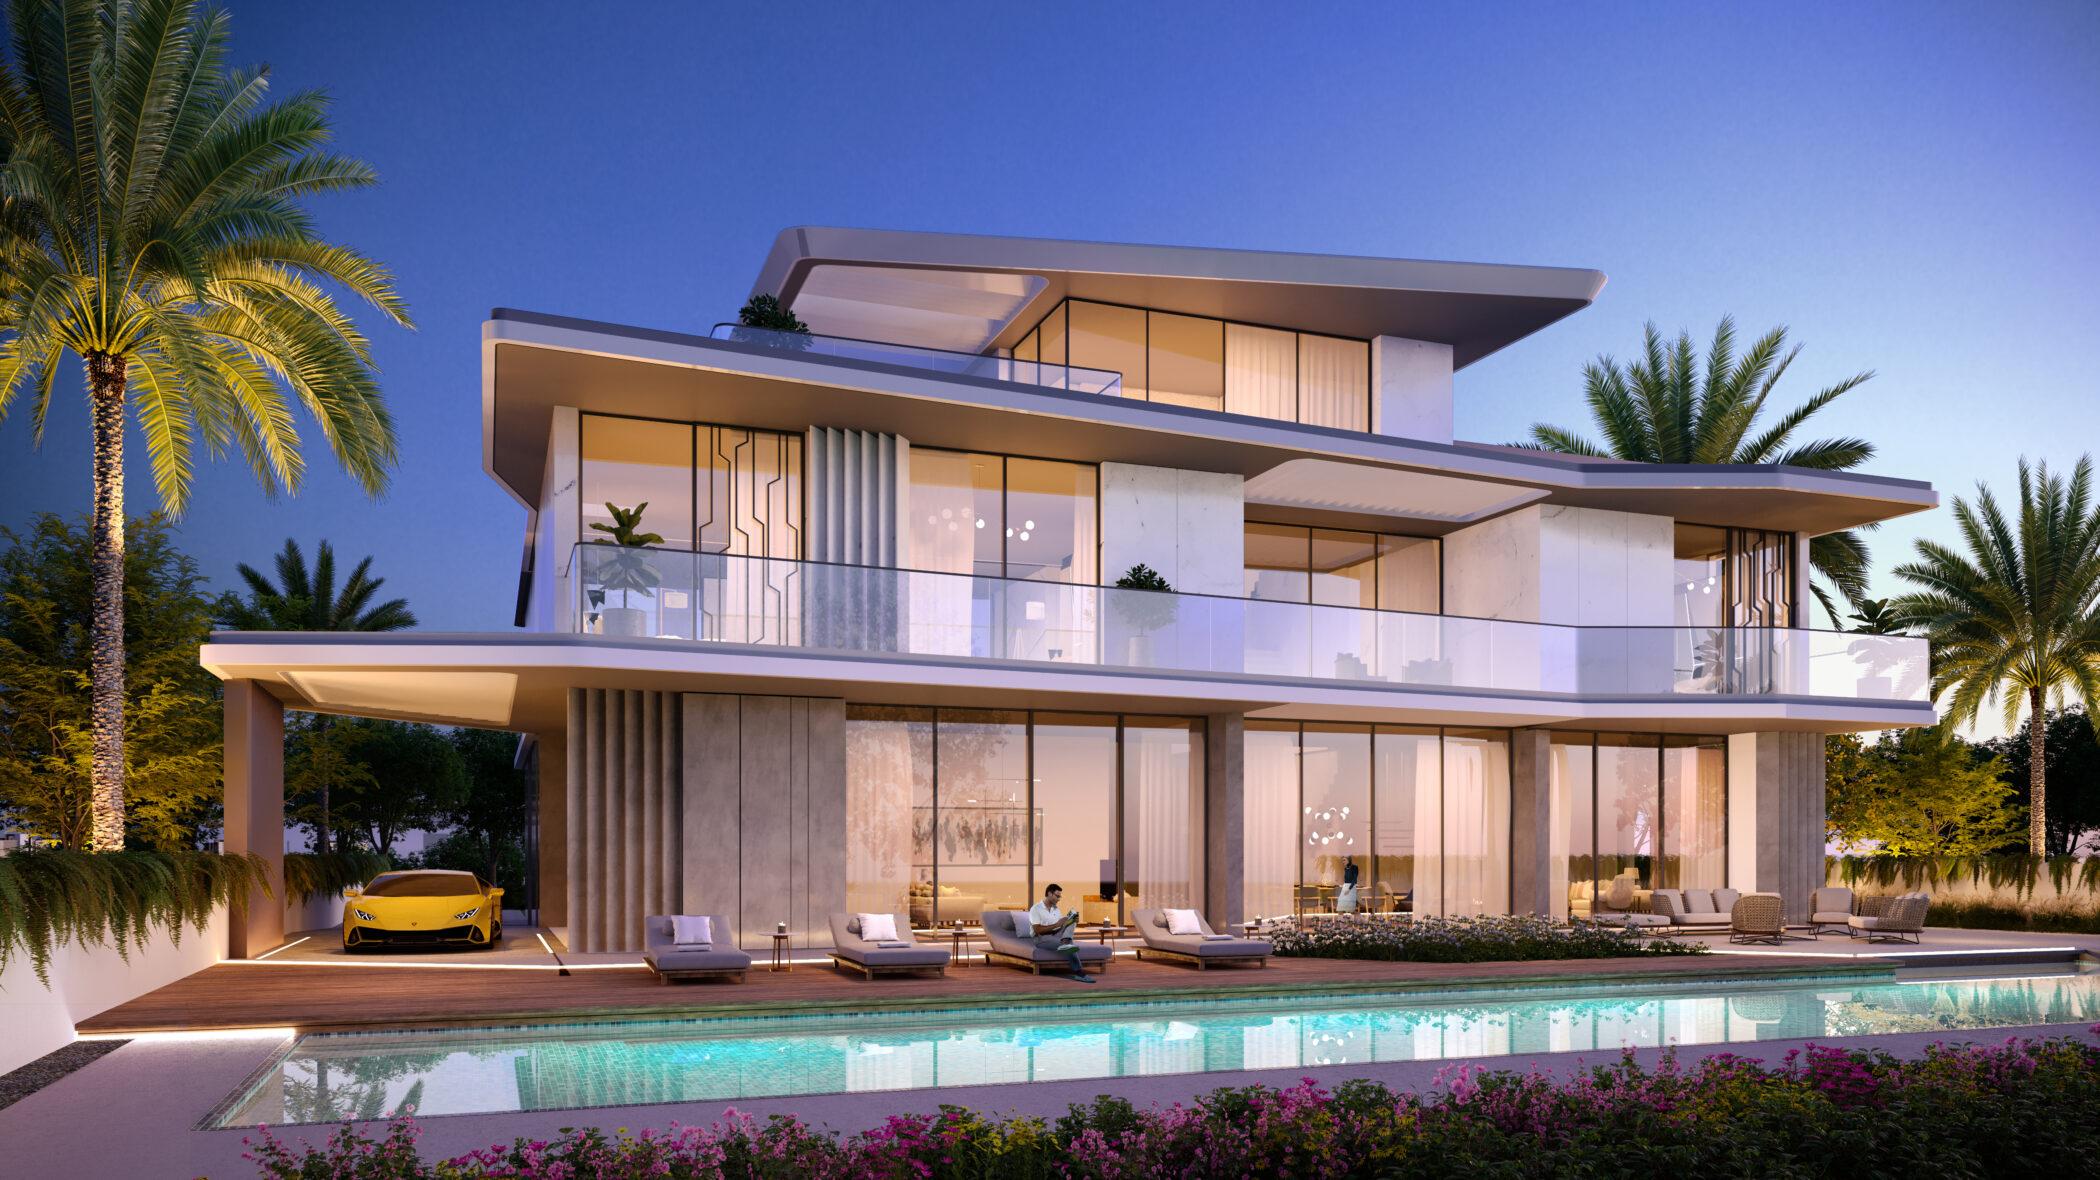 Dubai Hills Vista Inspired by Automobili Lamborghini in Dubai Hills Estate by Emaar. Wide selection of 6 bedroom villas for sale in Dubai 3 2